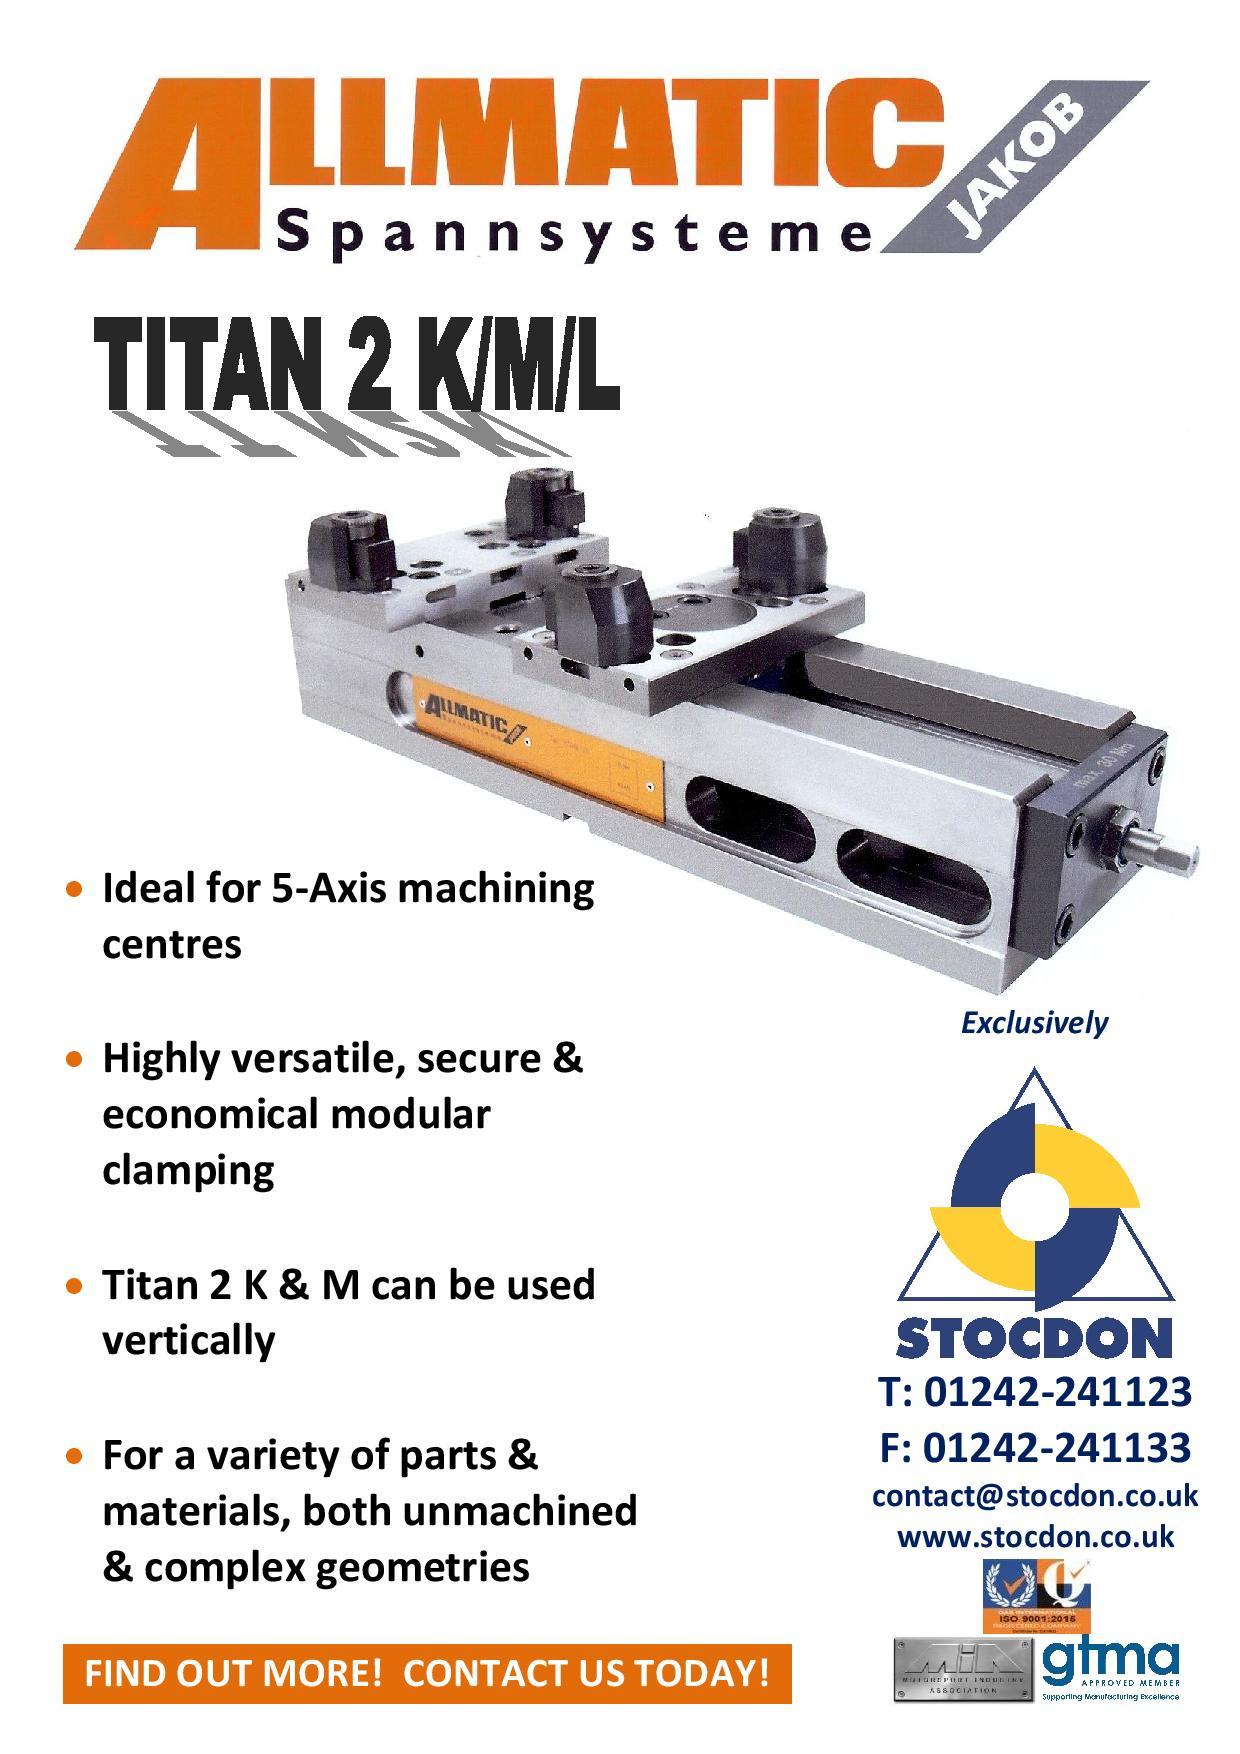 Allmatic-Titan2-KML-A5-Flyer-2017-page-001.jpg